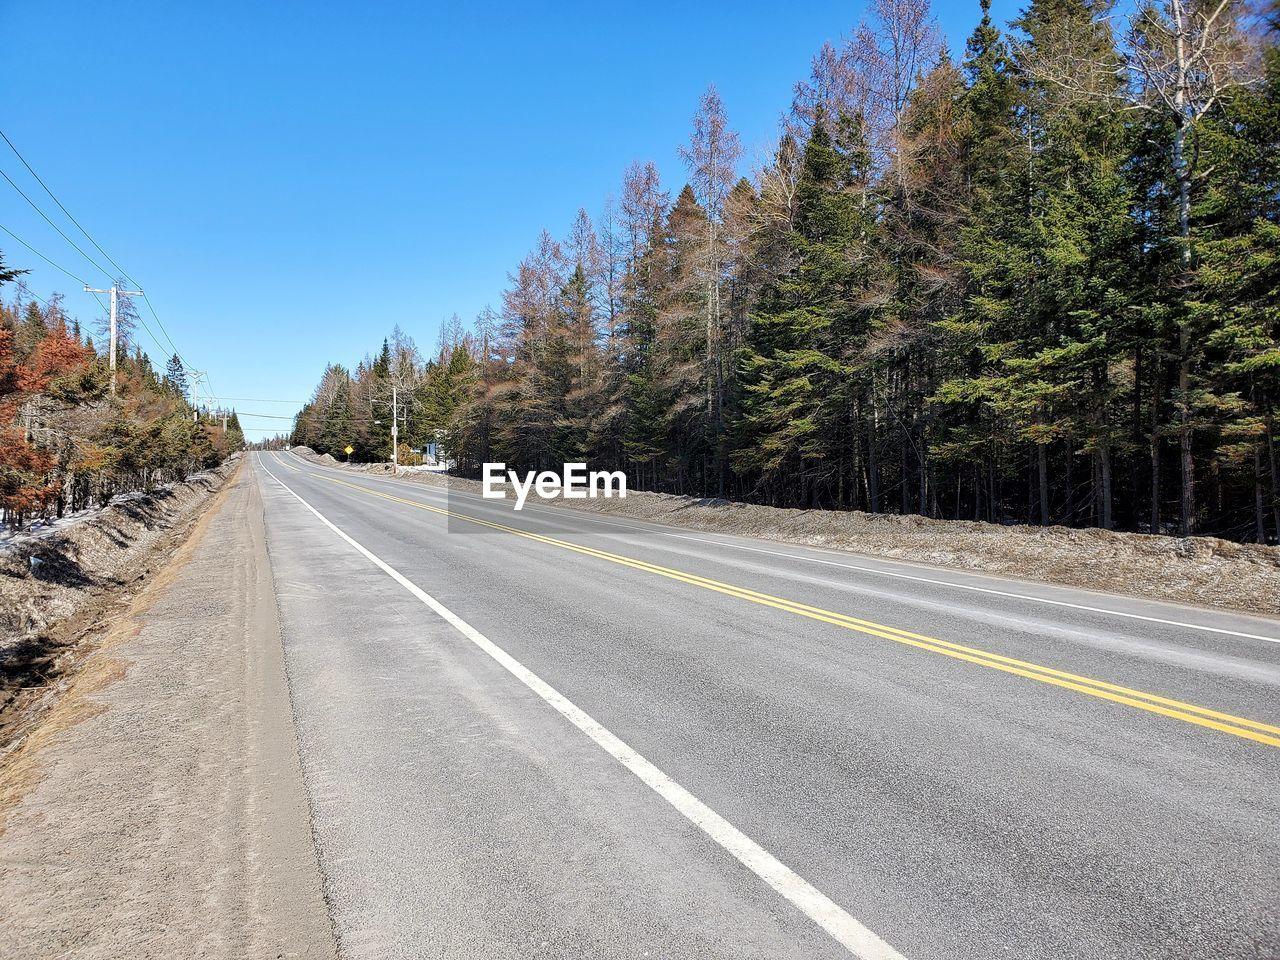 The road foreward and make progress